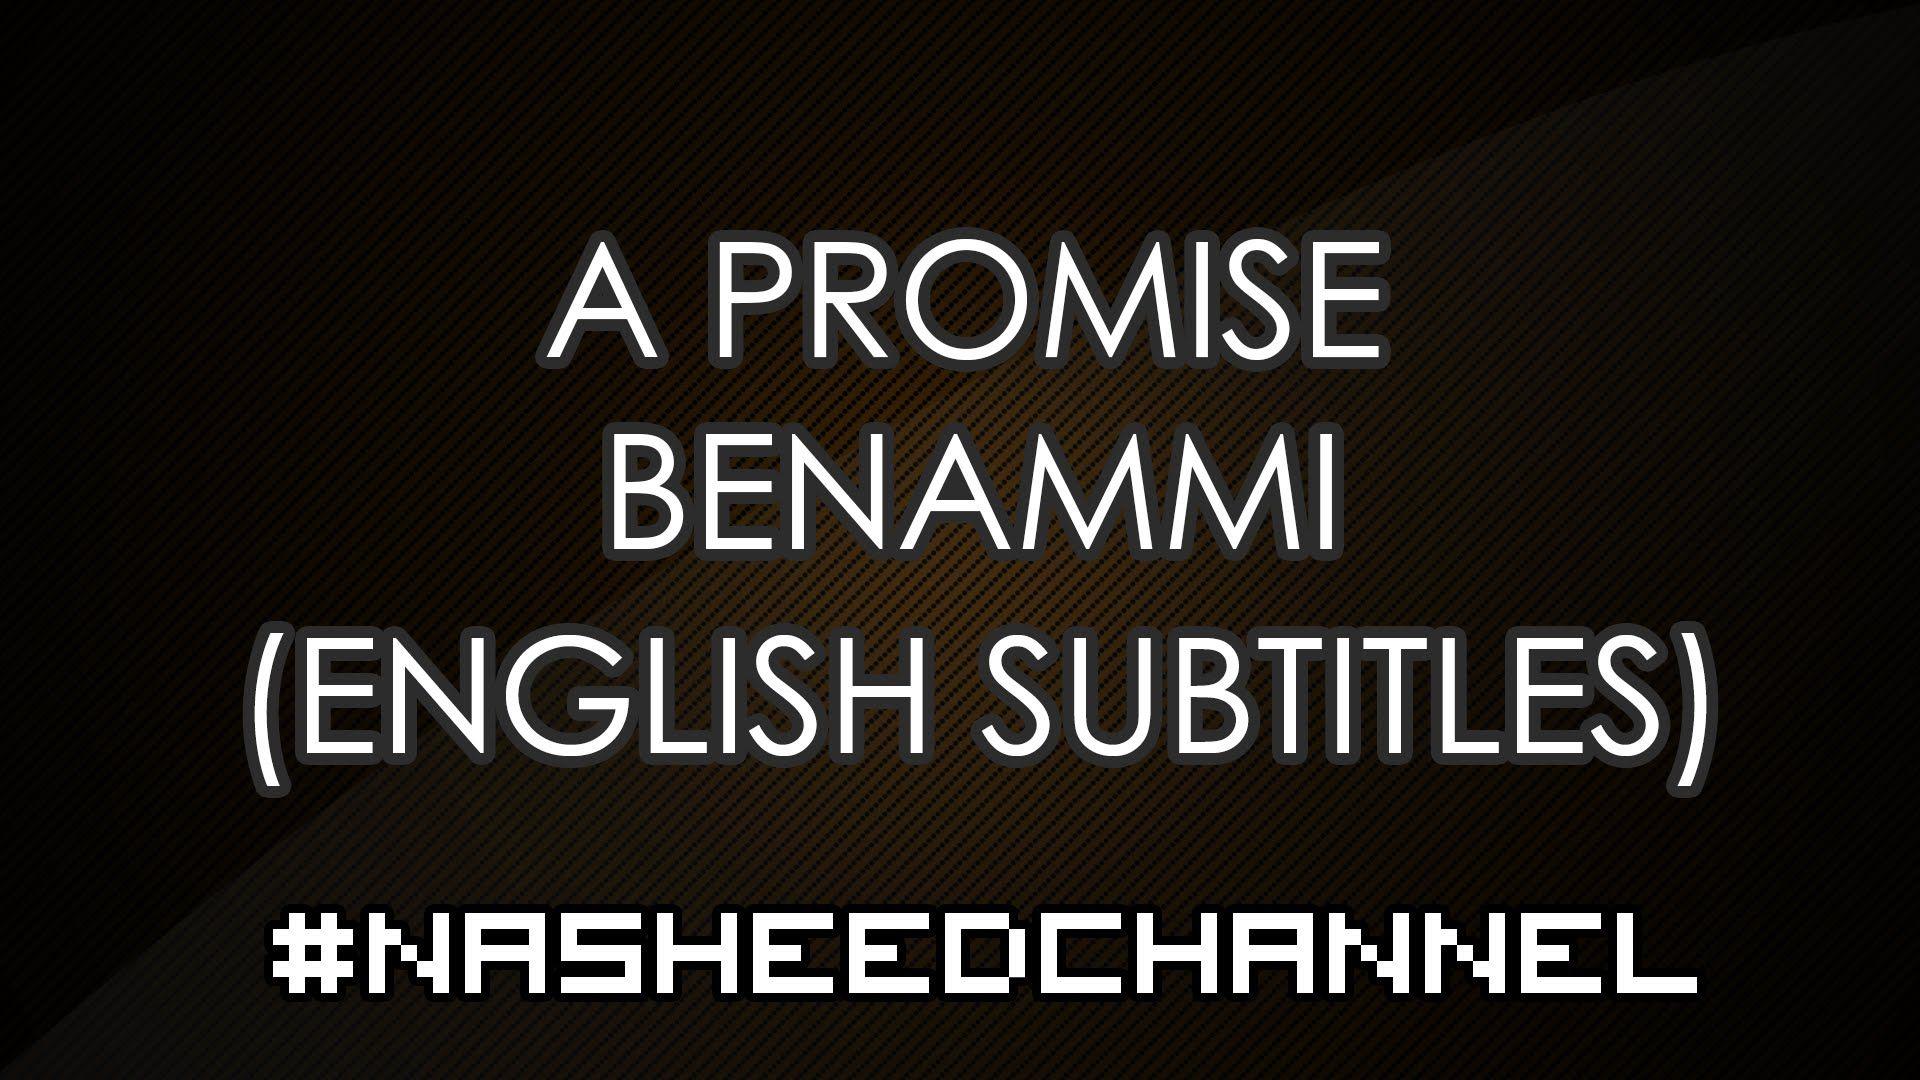 a promise benammi song